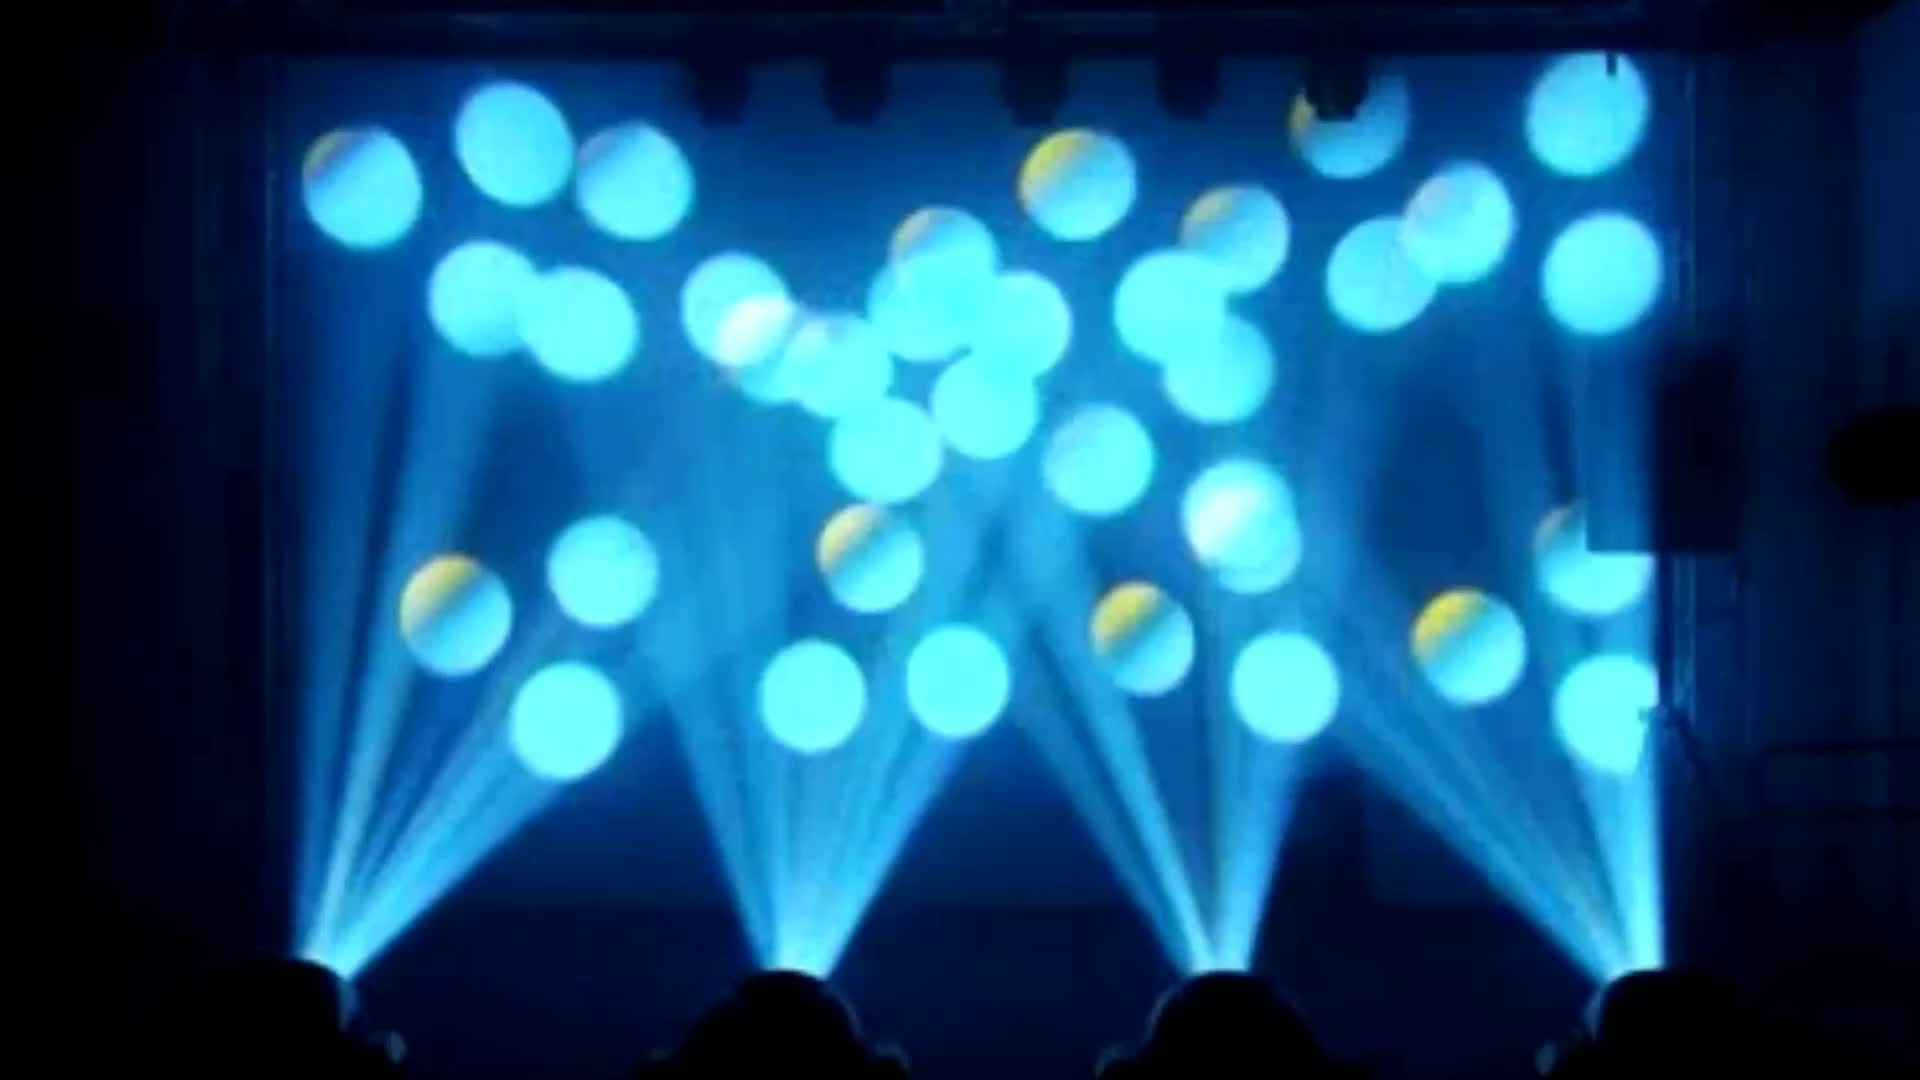 Hot Sale 60W White LED Spot Moving Head Light